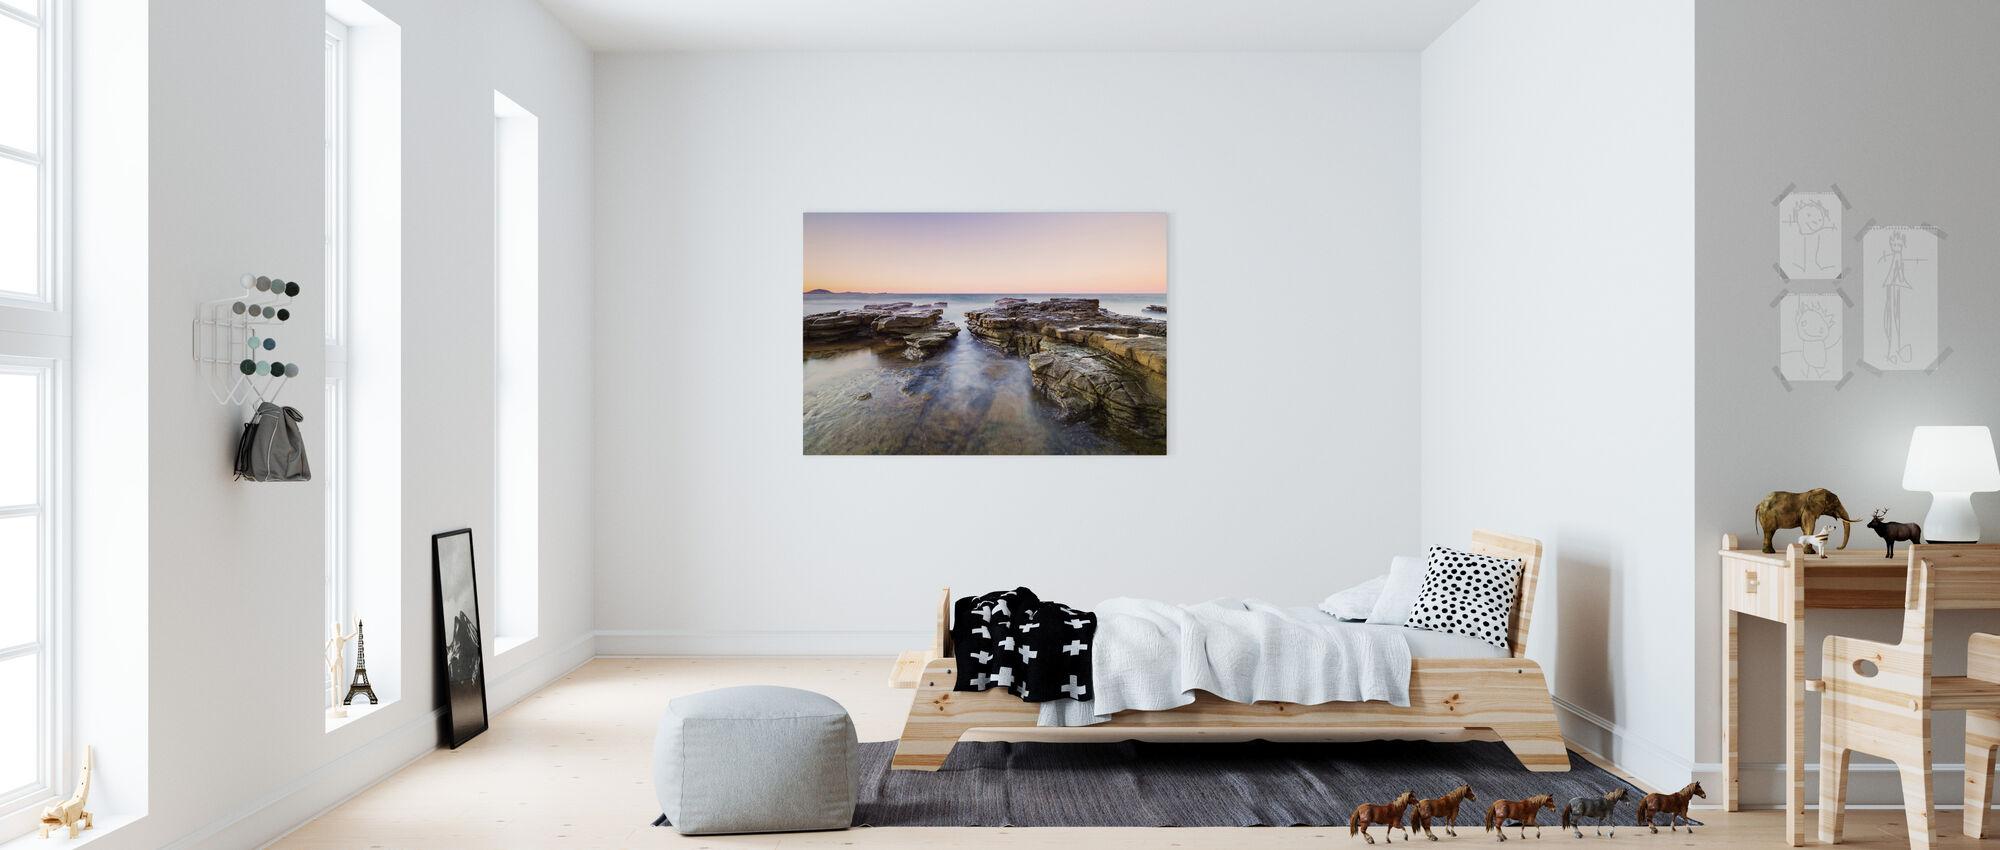 Mooloolaba Horizon, Queensland Australië - Canvas print - Kinderkamer